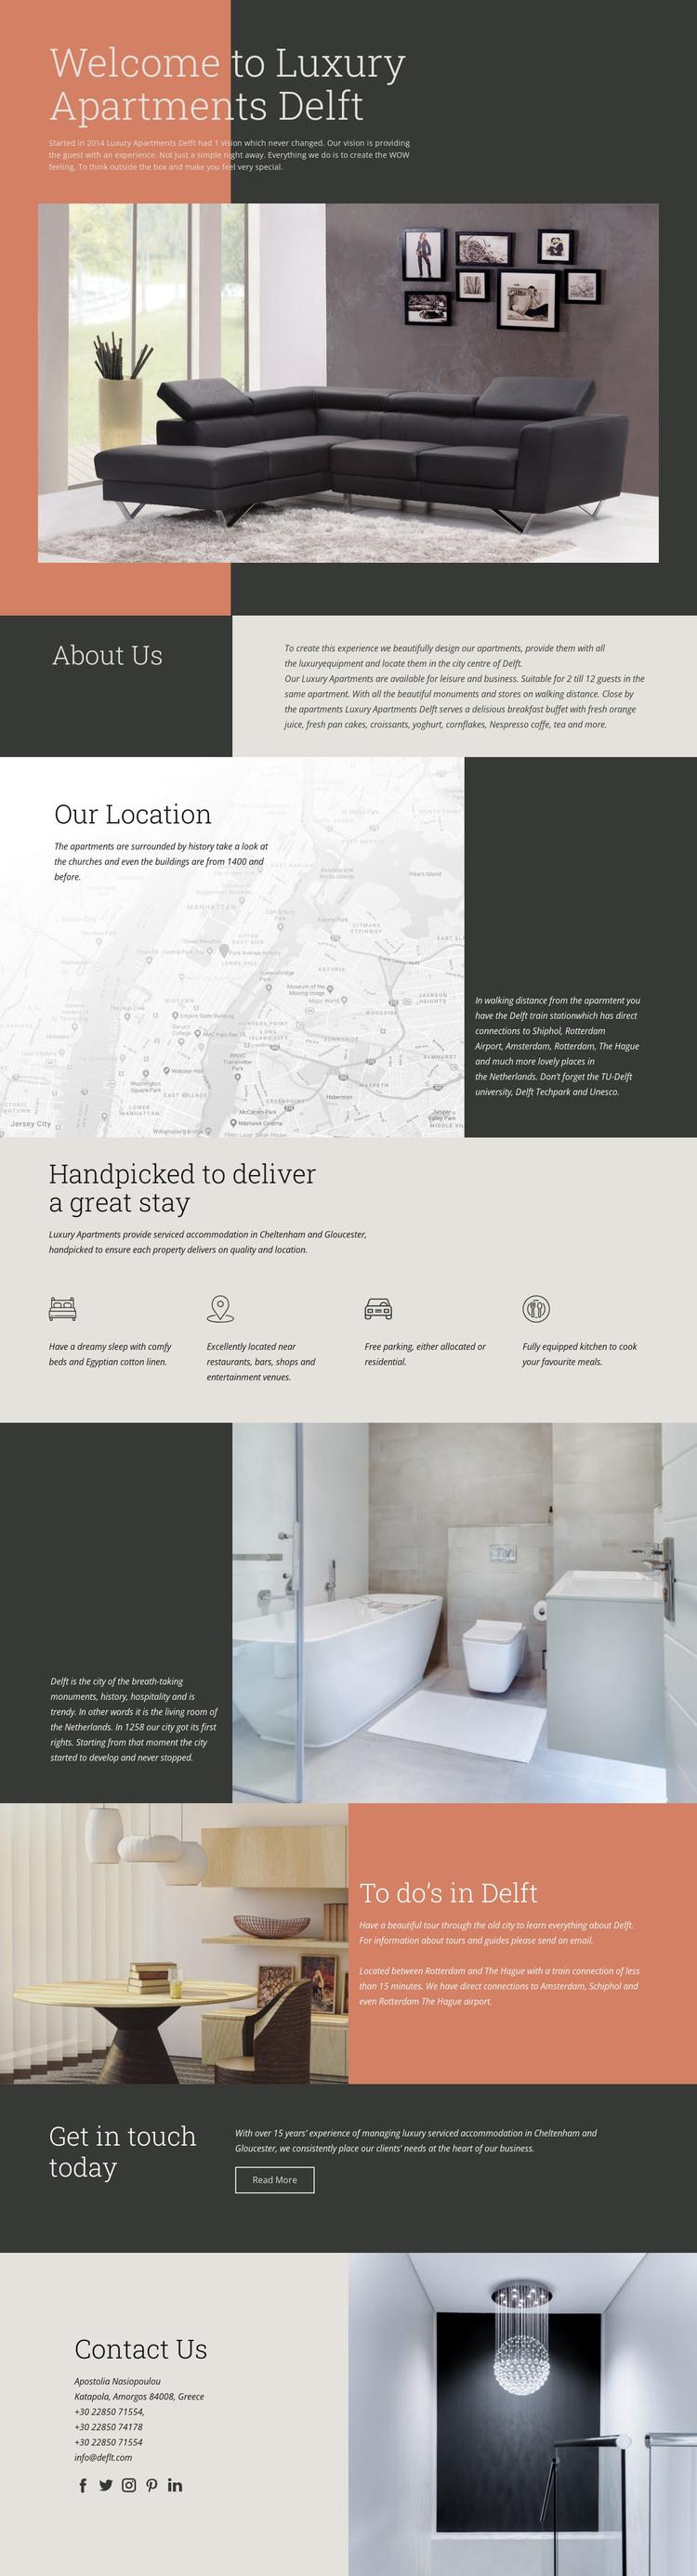 Luxury Apartments Web Design